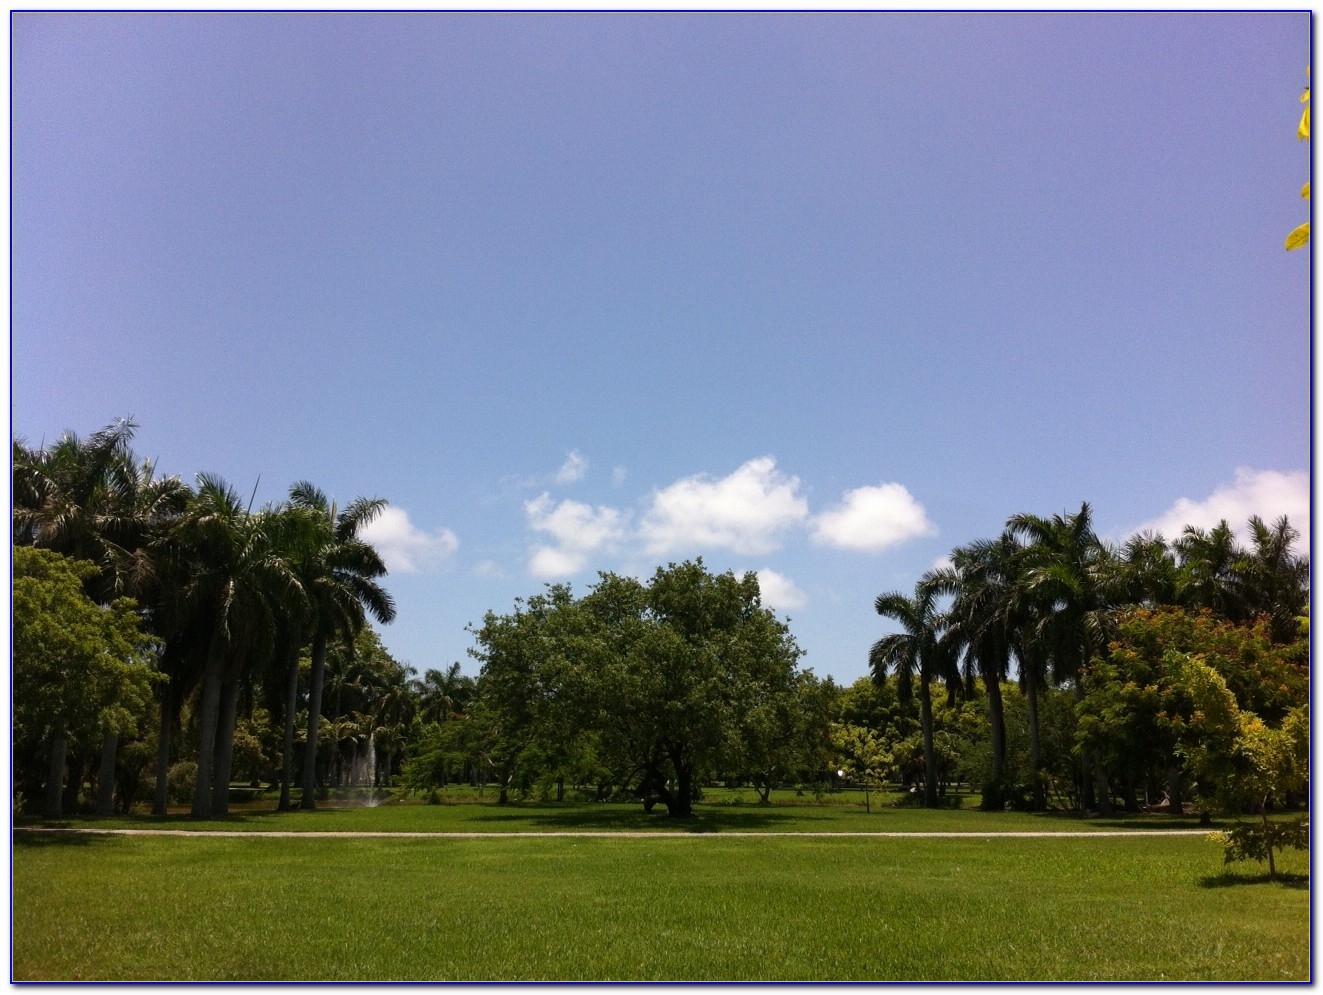 La Fitness Miami Gardens Phone